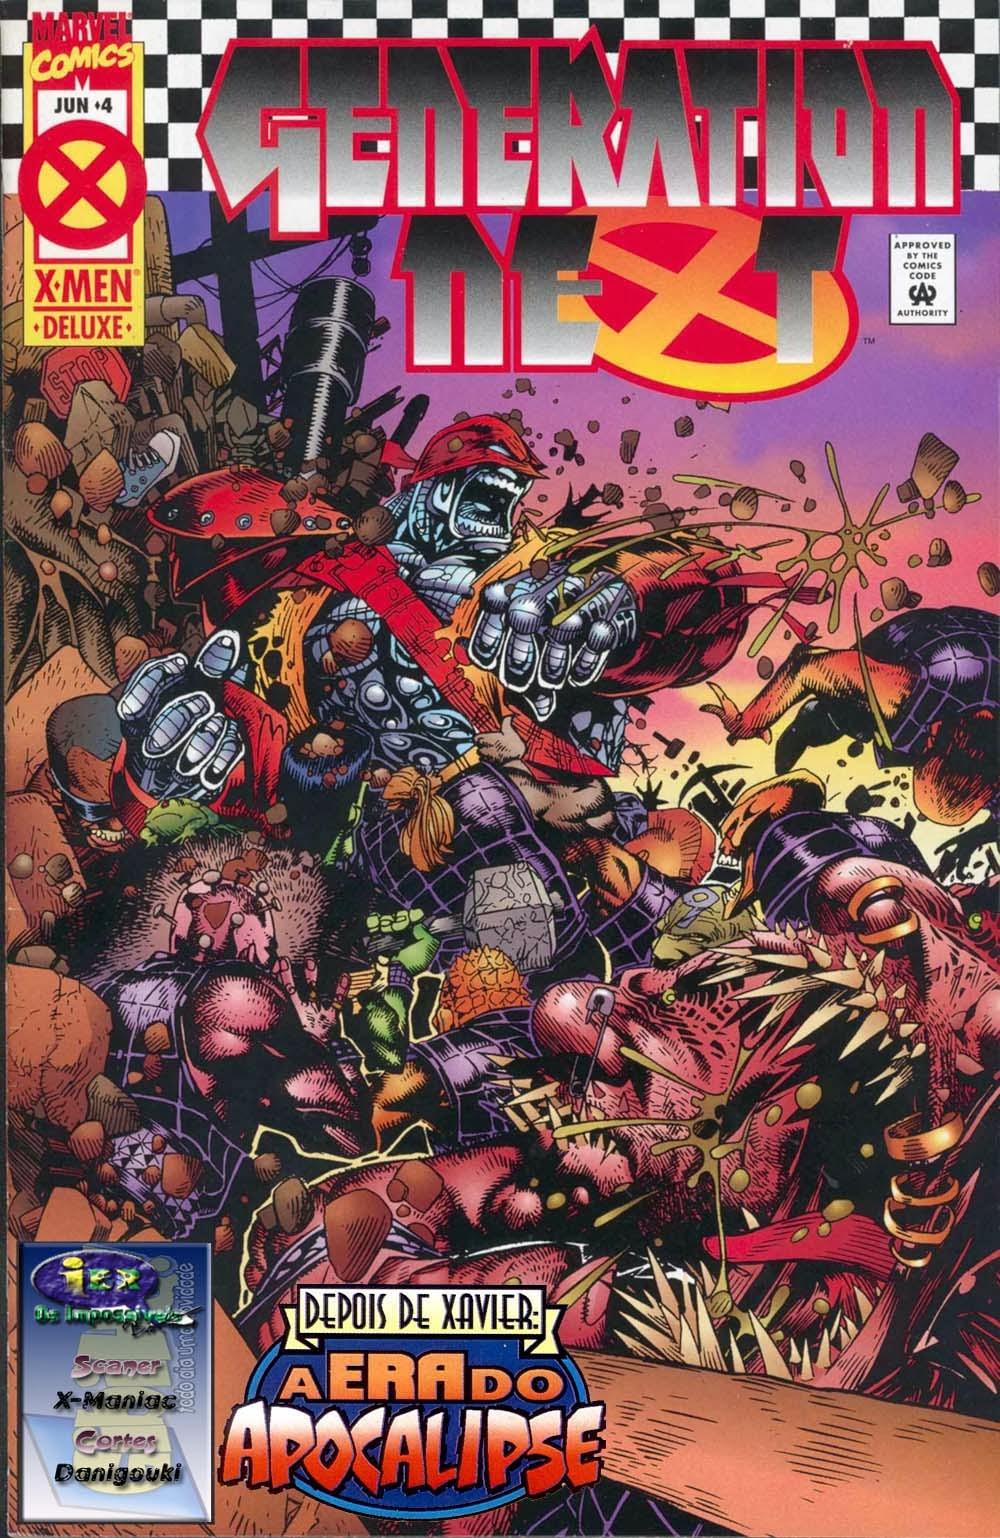 X-Men - A Era do Apocalipse #39